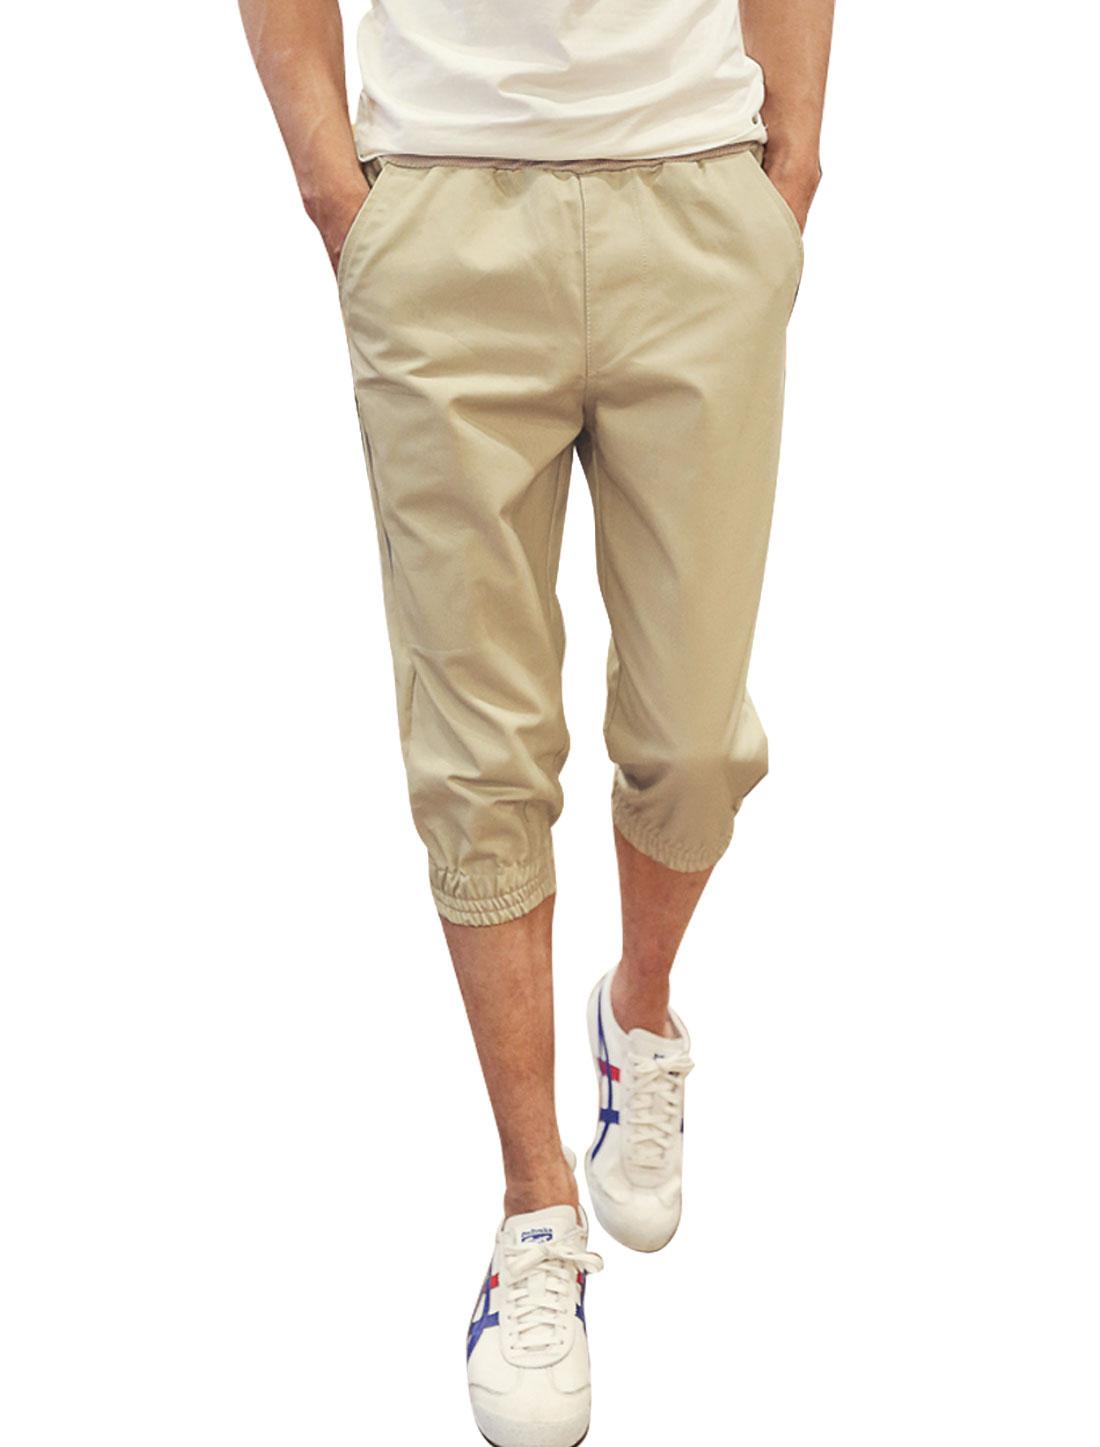 Men Elastic Waist Letters Embroidery Zip Pocket Capri Pants Khaki W30